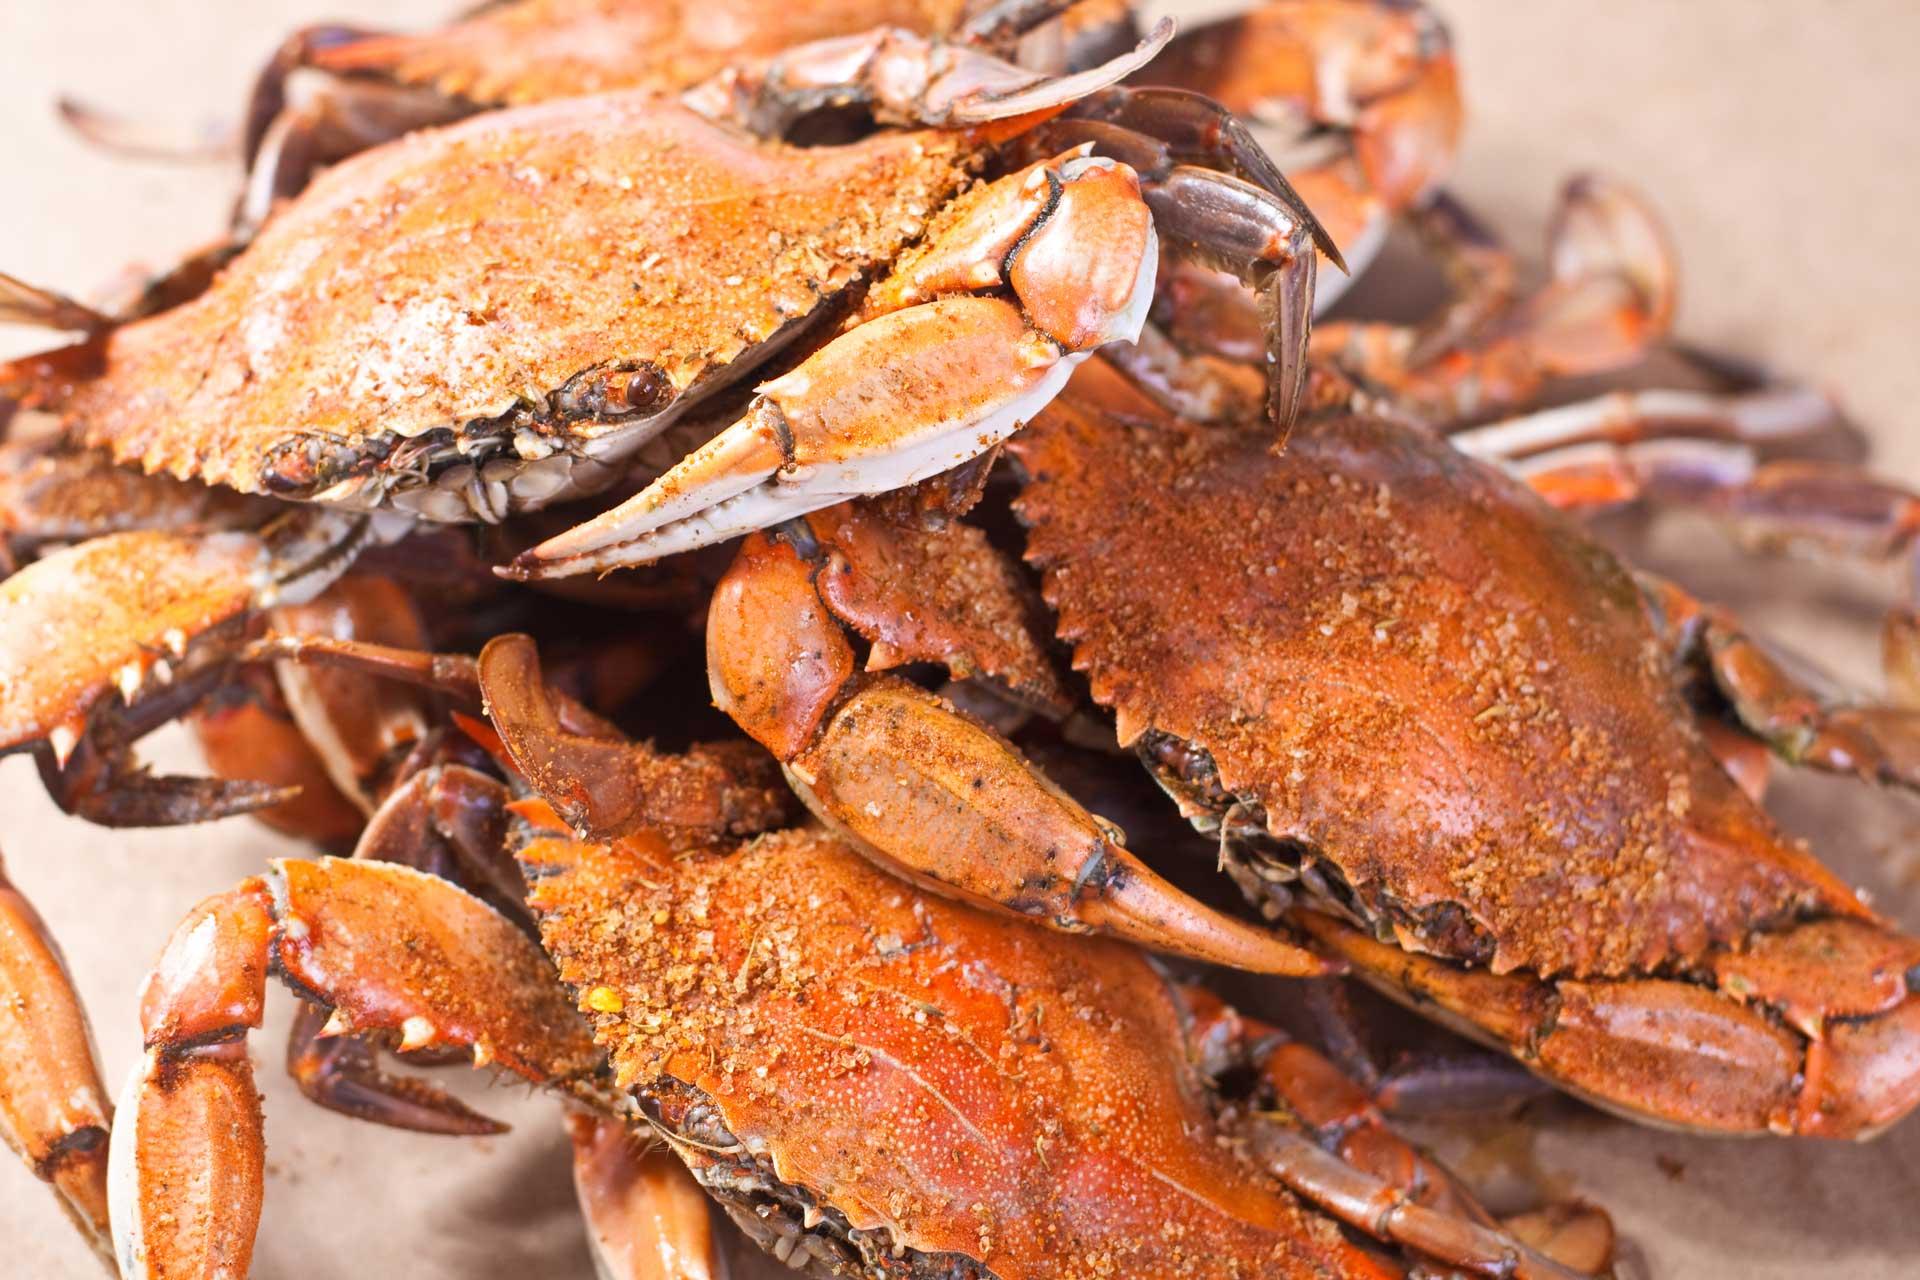 The Difference Between Maryland, Carolina, and Louisiana Crab